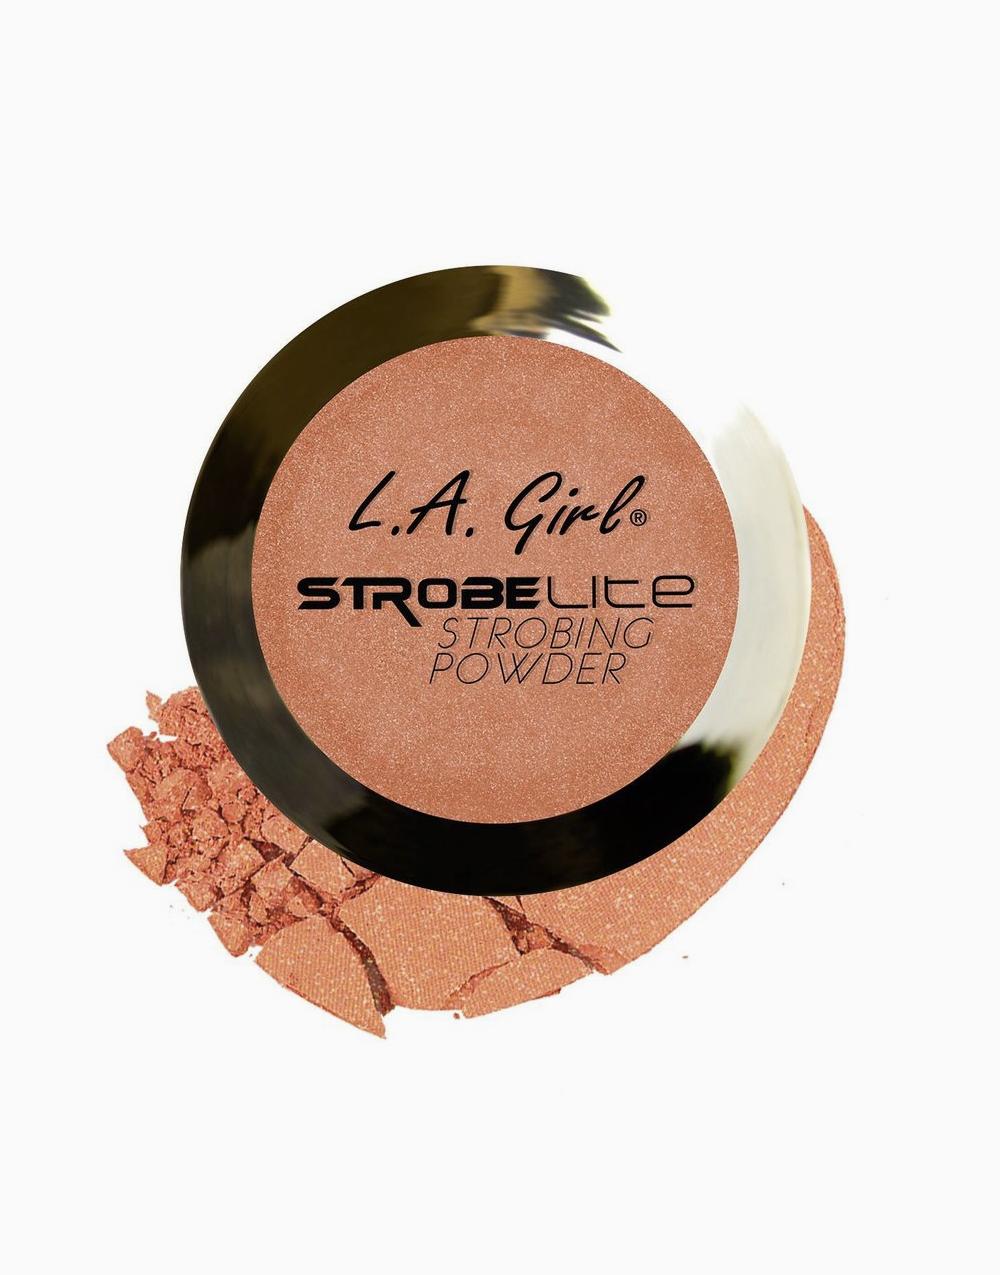 Strobelite Strobing Powder by L.A. Girl | 40 WATT